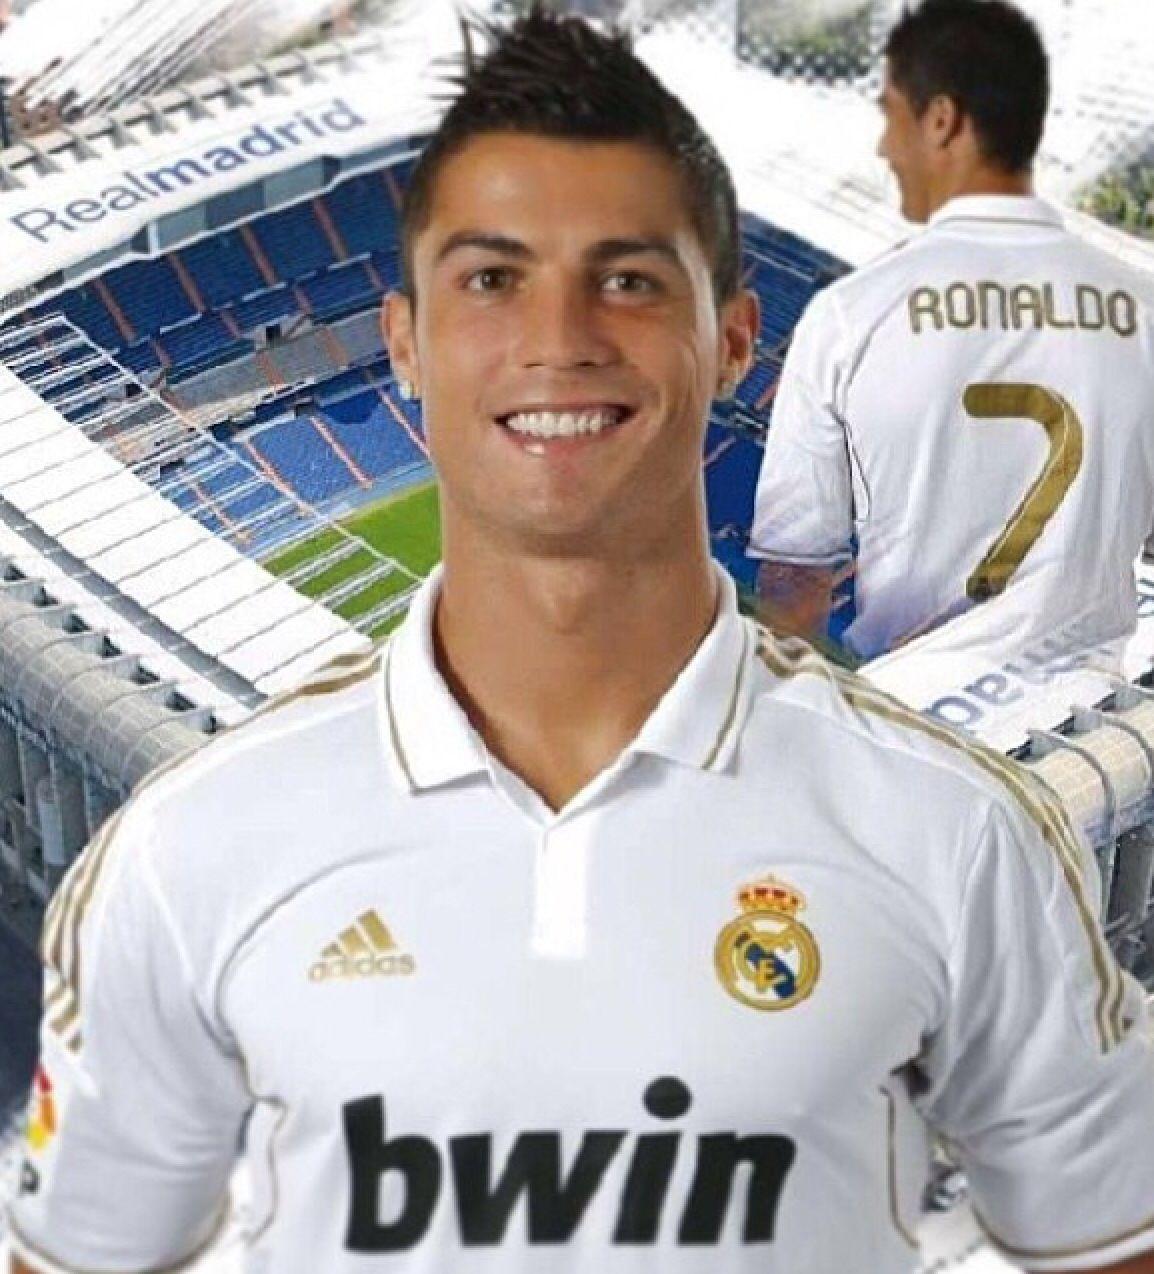 #cristiano #ronaldo #cristianoronaldo #soccer #flyemirates #cr7 #smile  #sexiestman